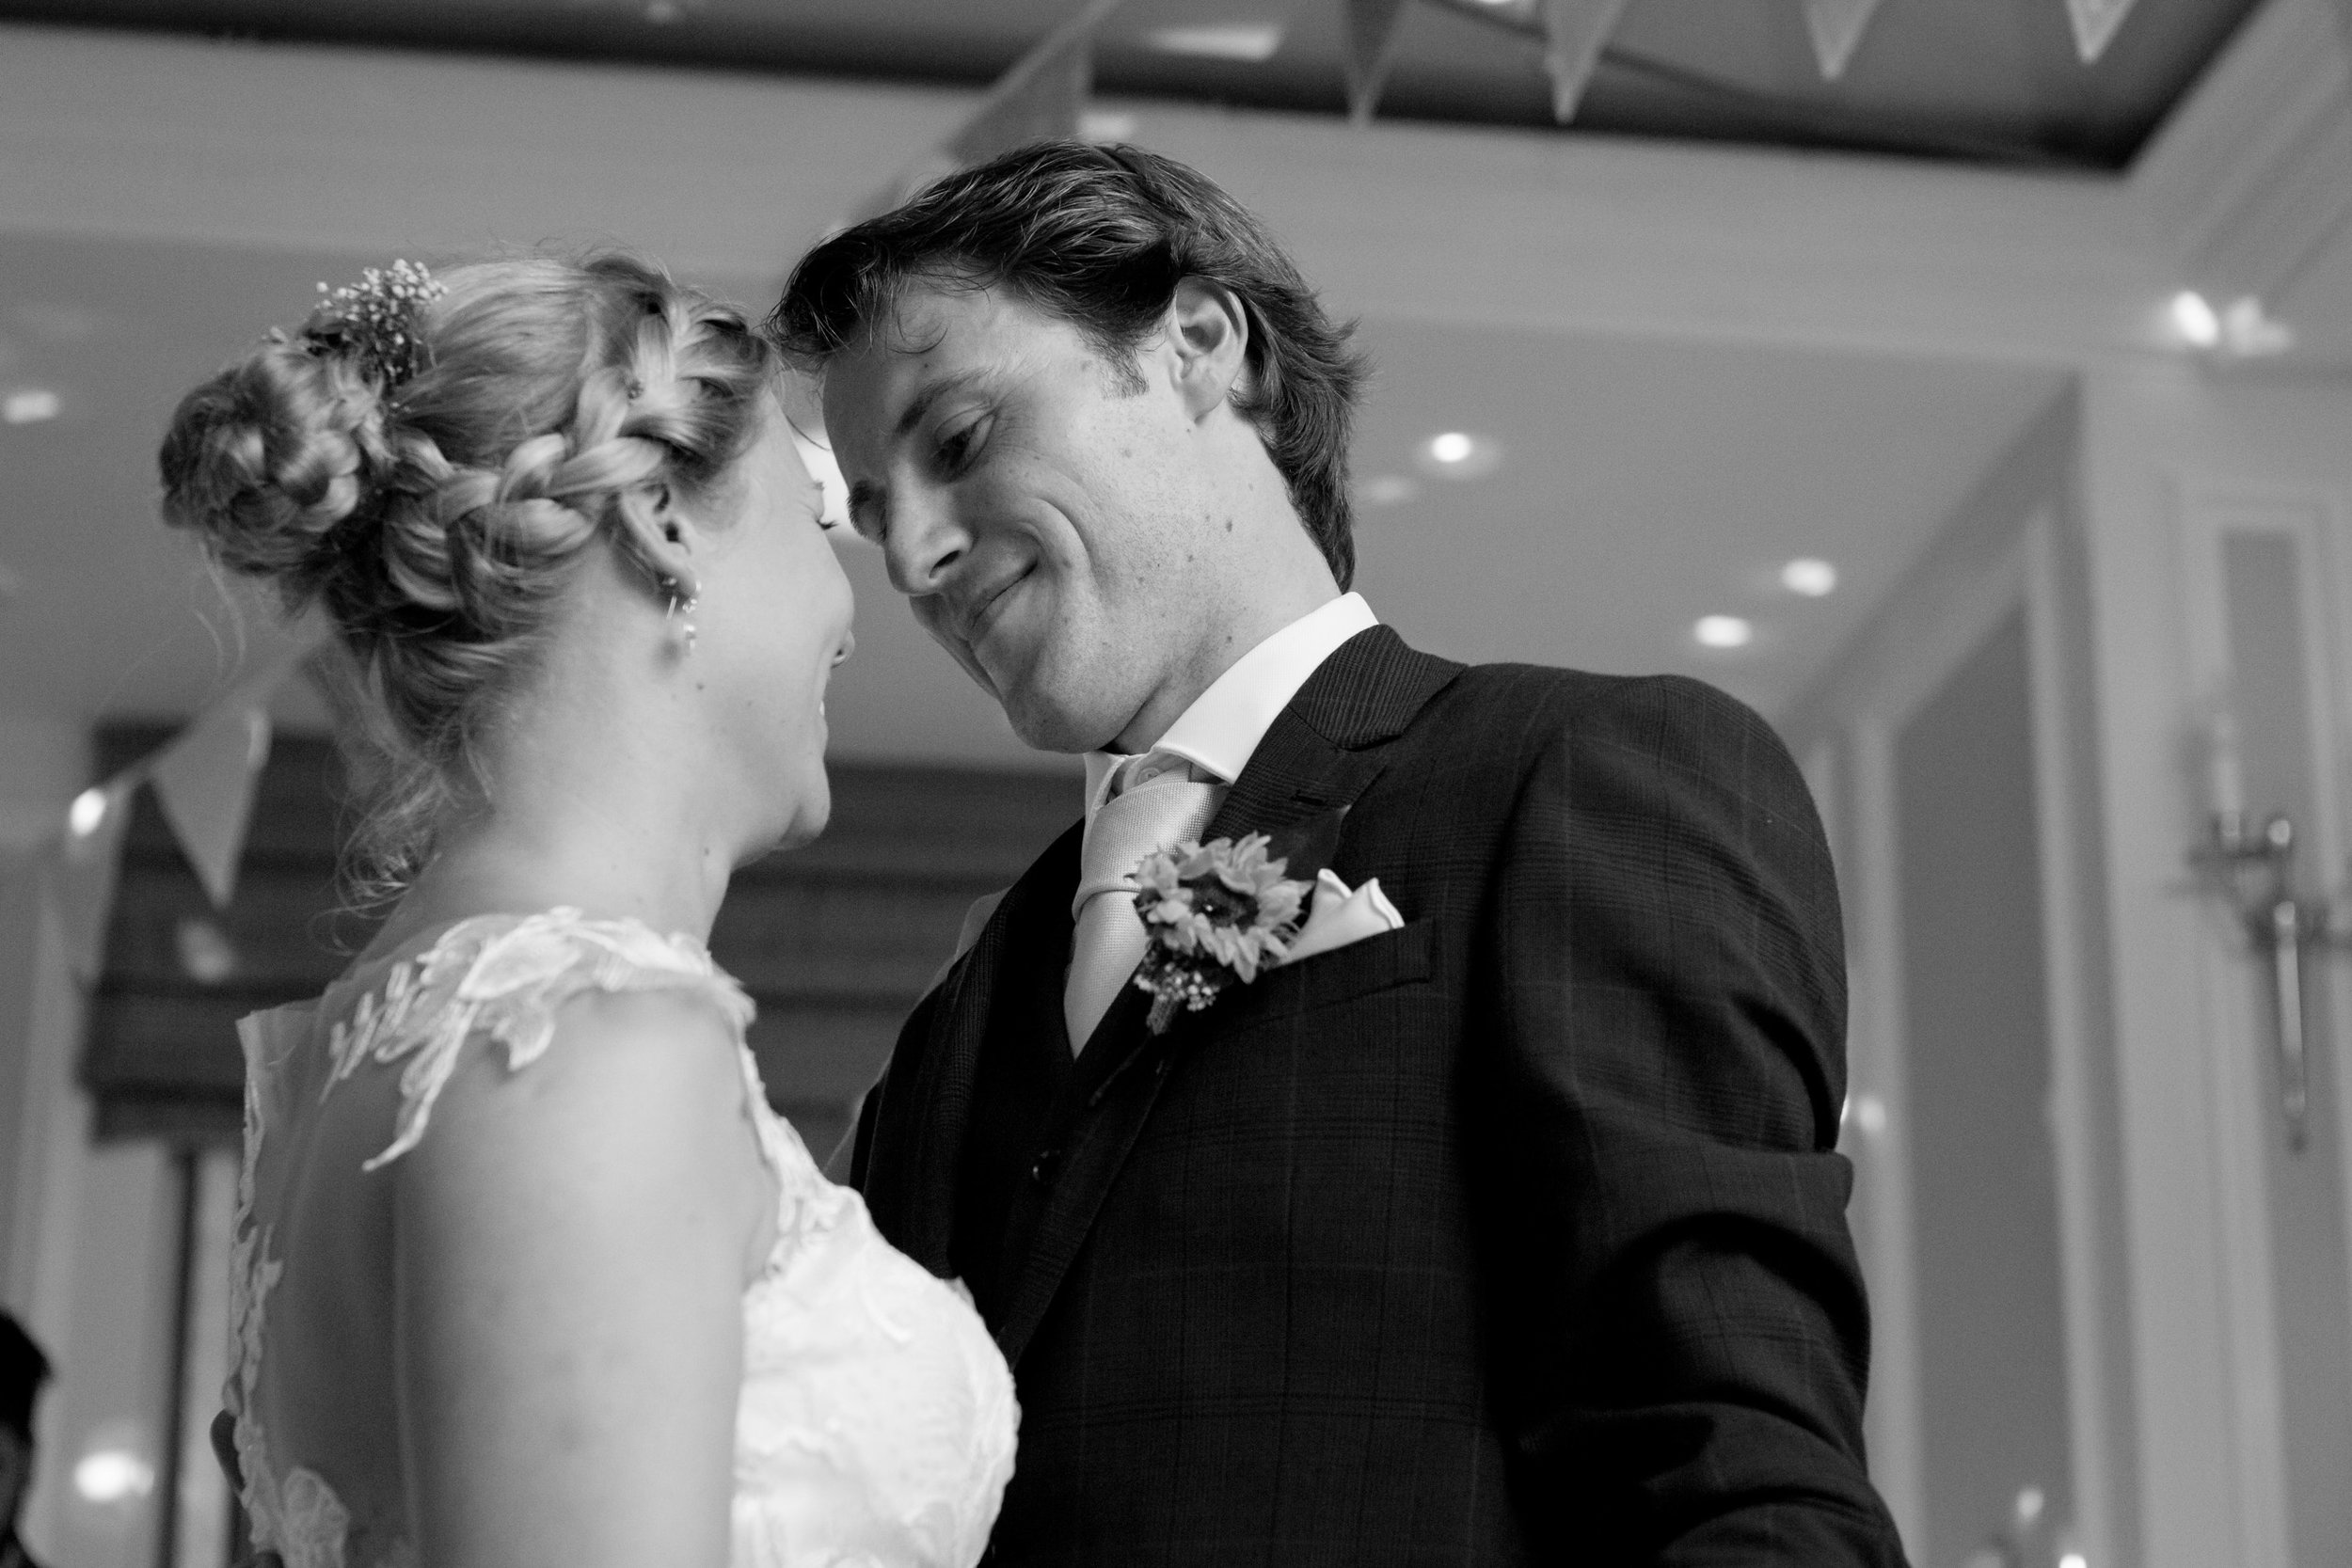 Bucklands-Tout-Saints-Hotel-Devon-Wedding-Photography-41.jpg